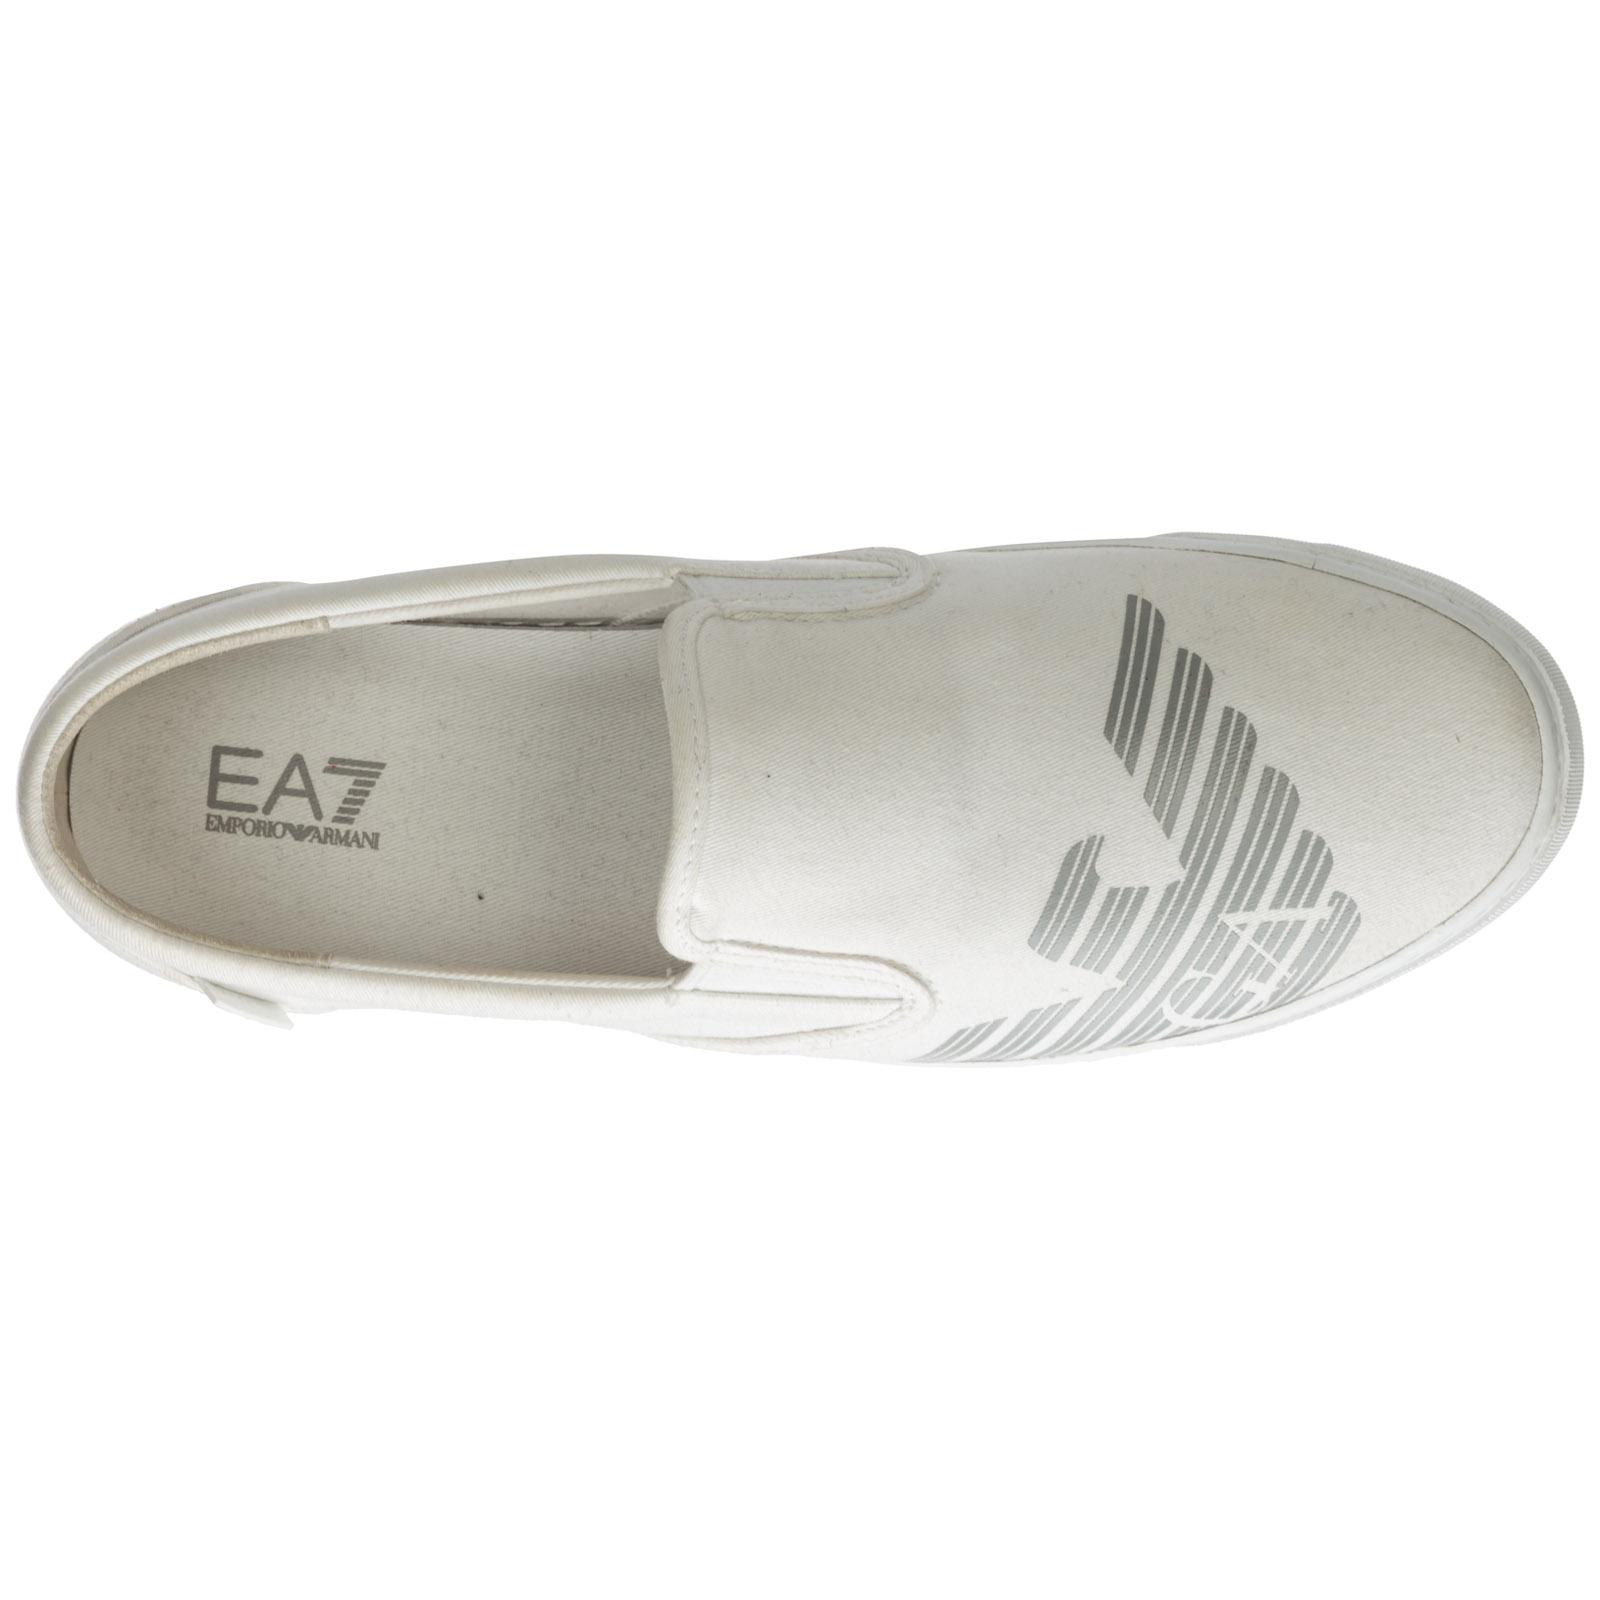 Slip-on shoes Emporio Armani EA7